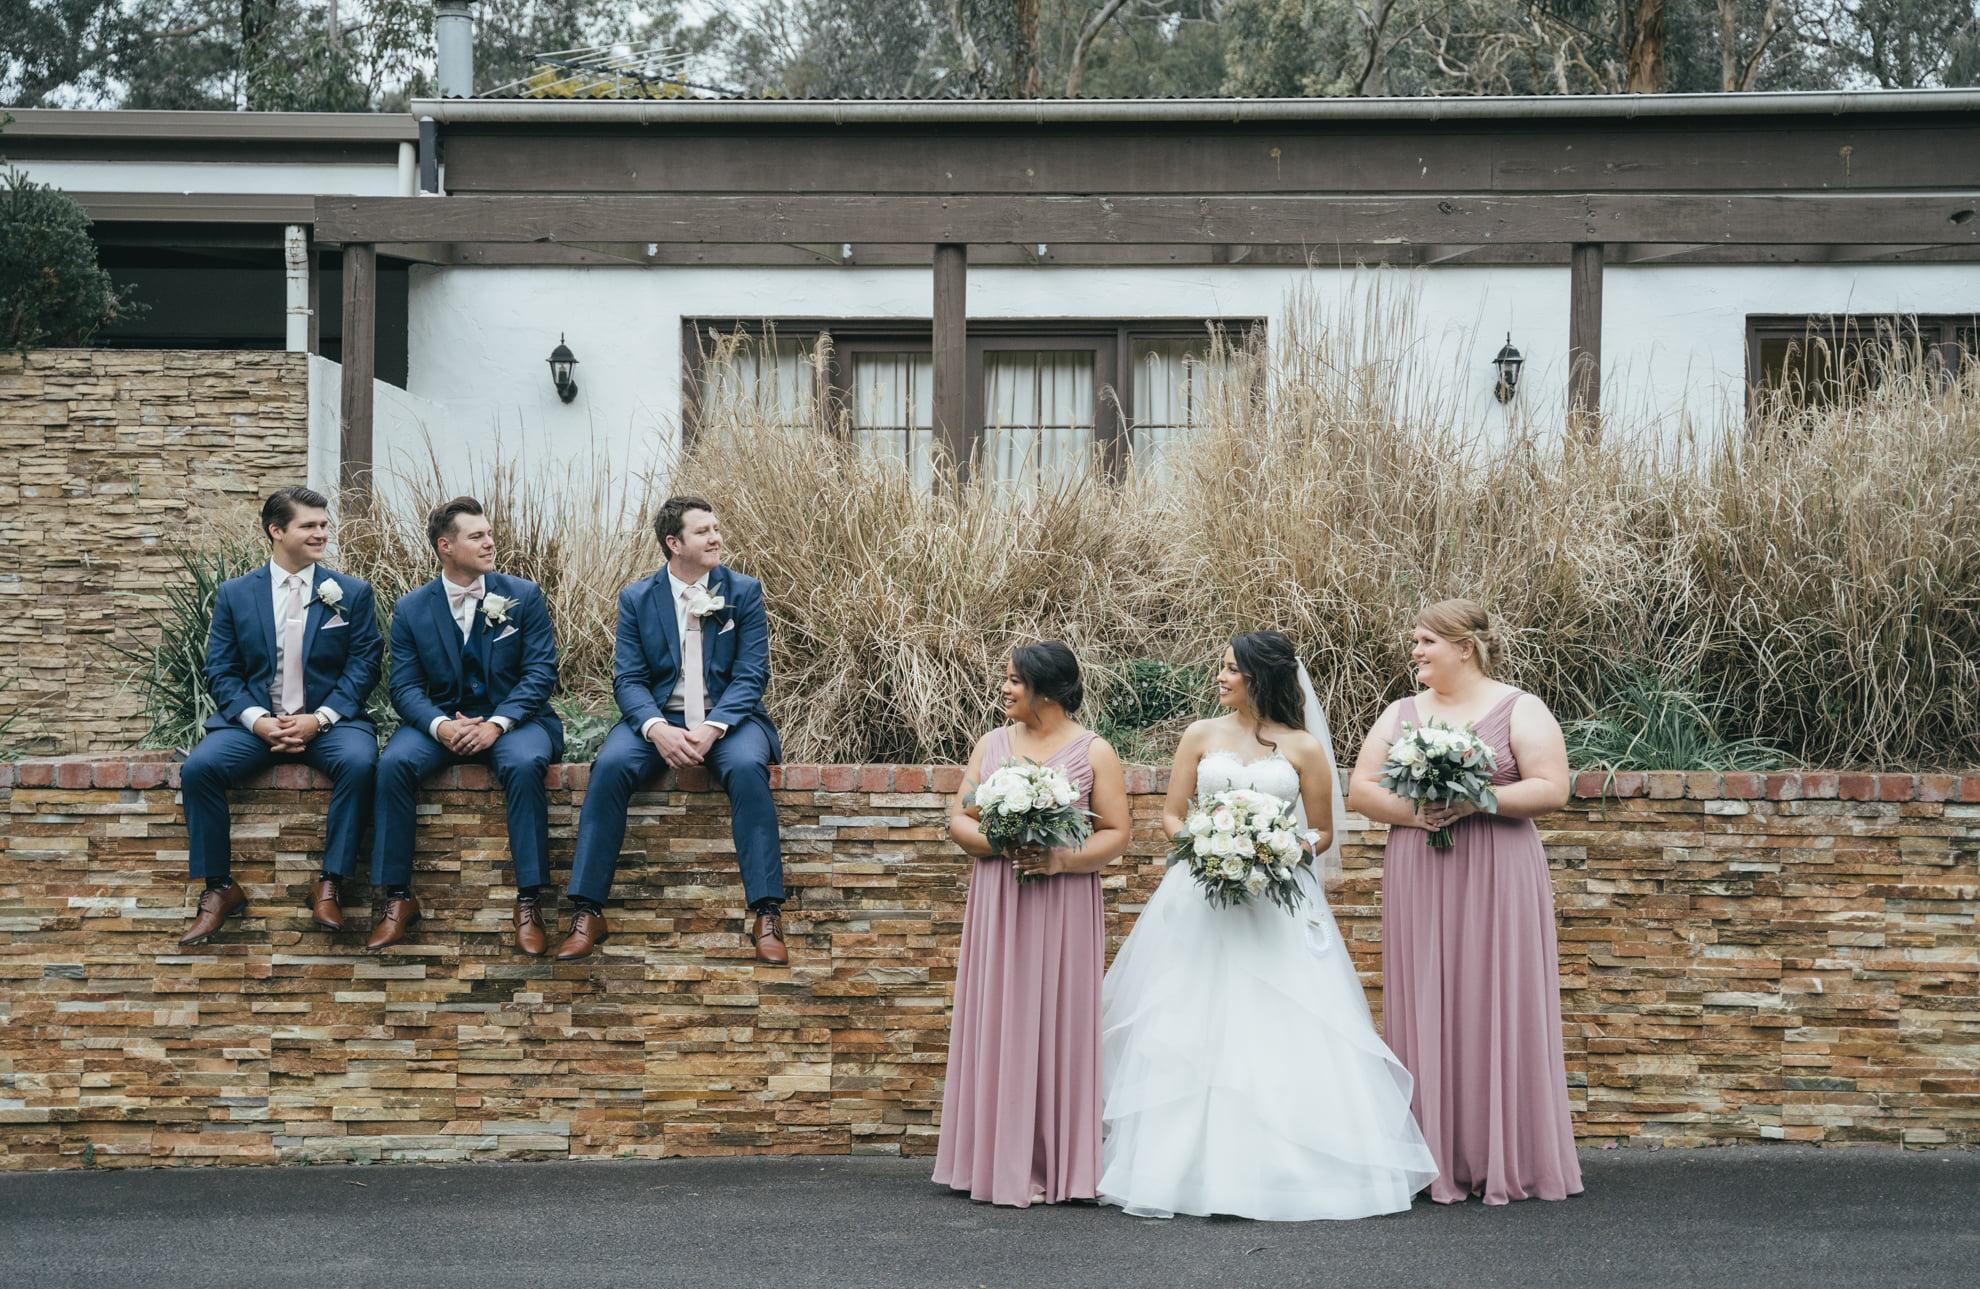 Bridesmaids alterations